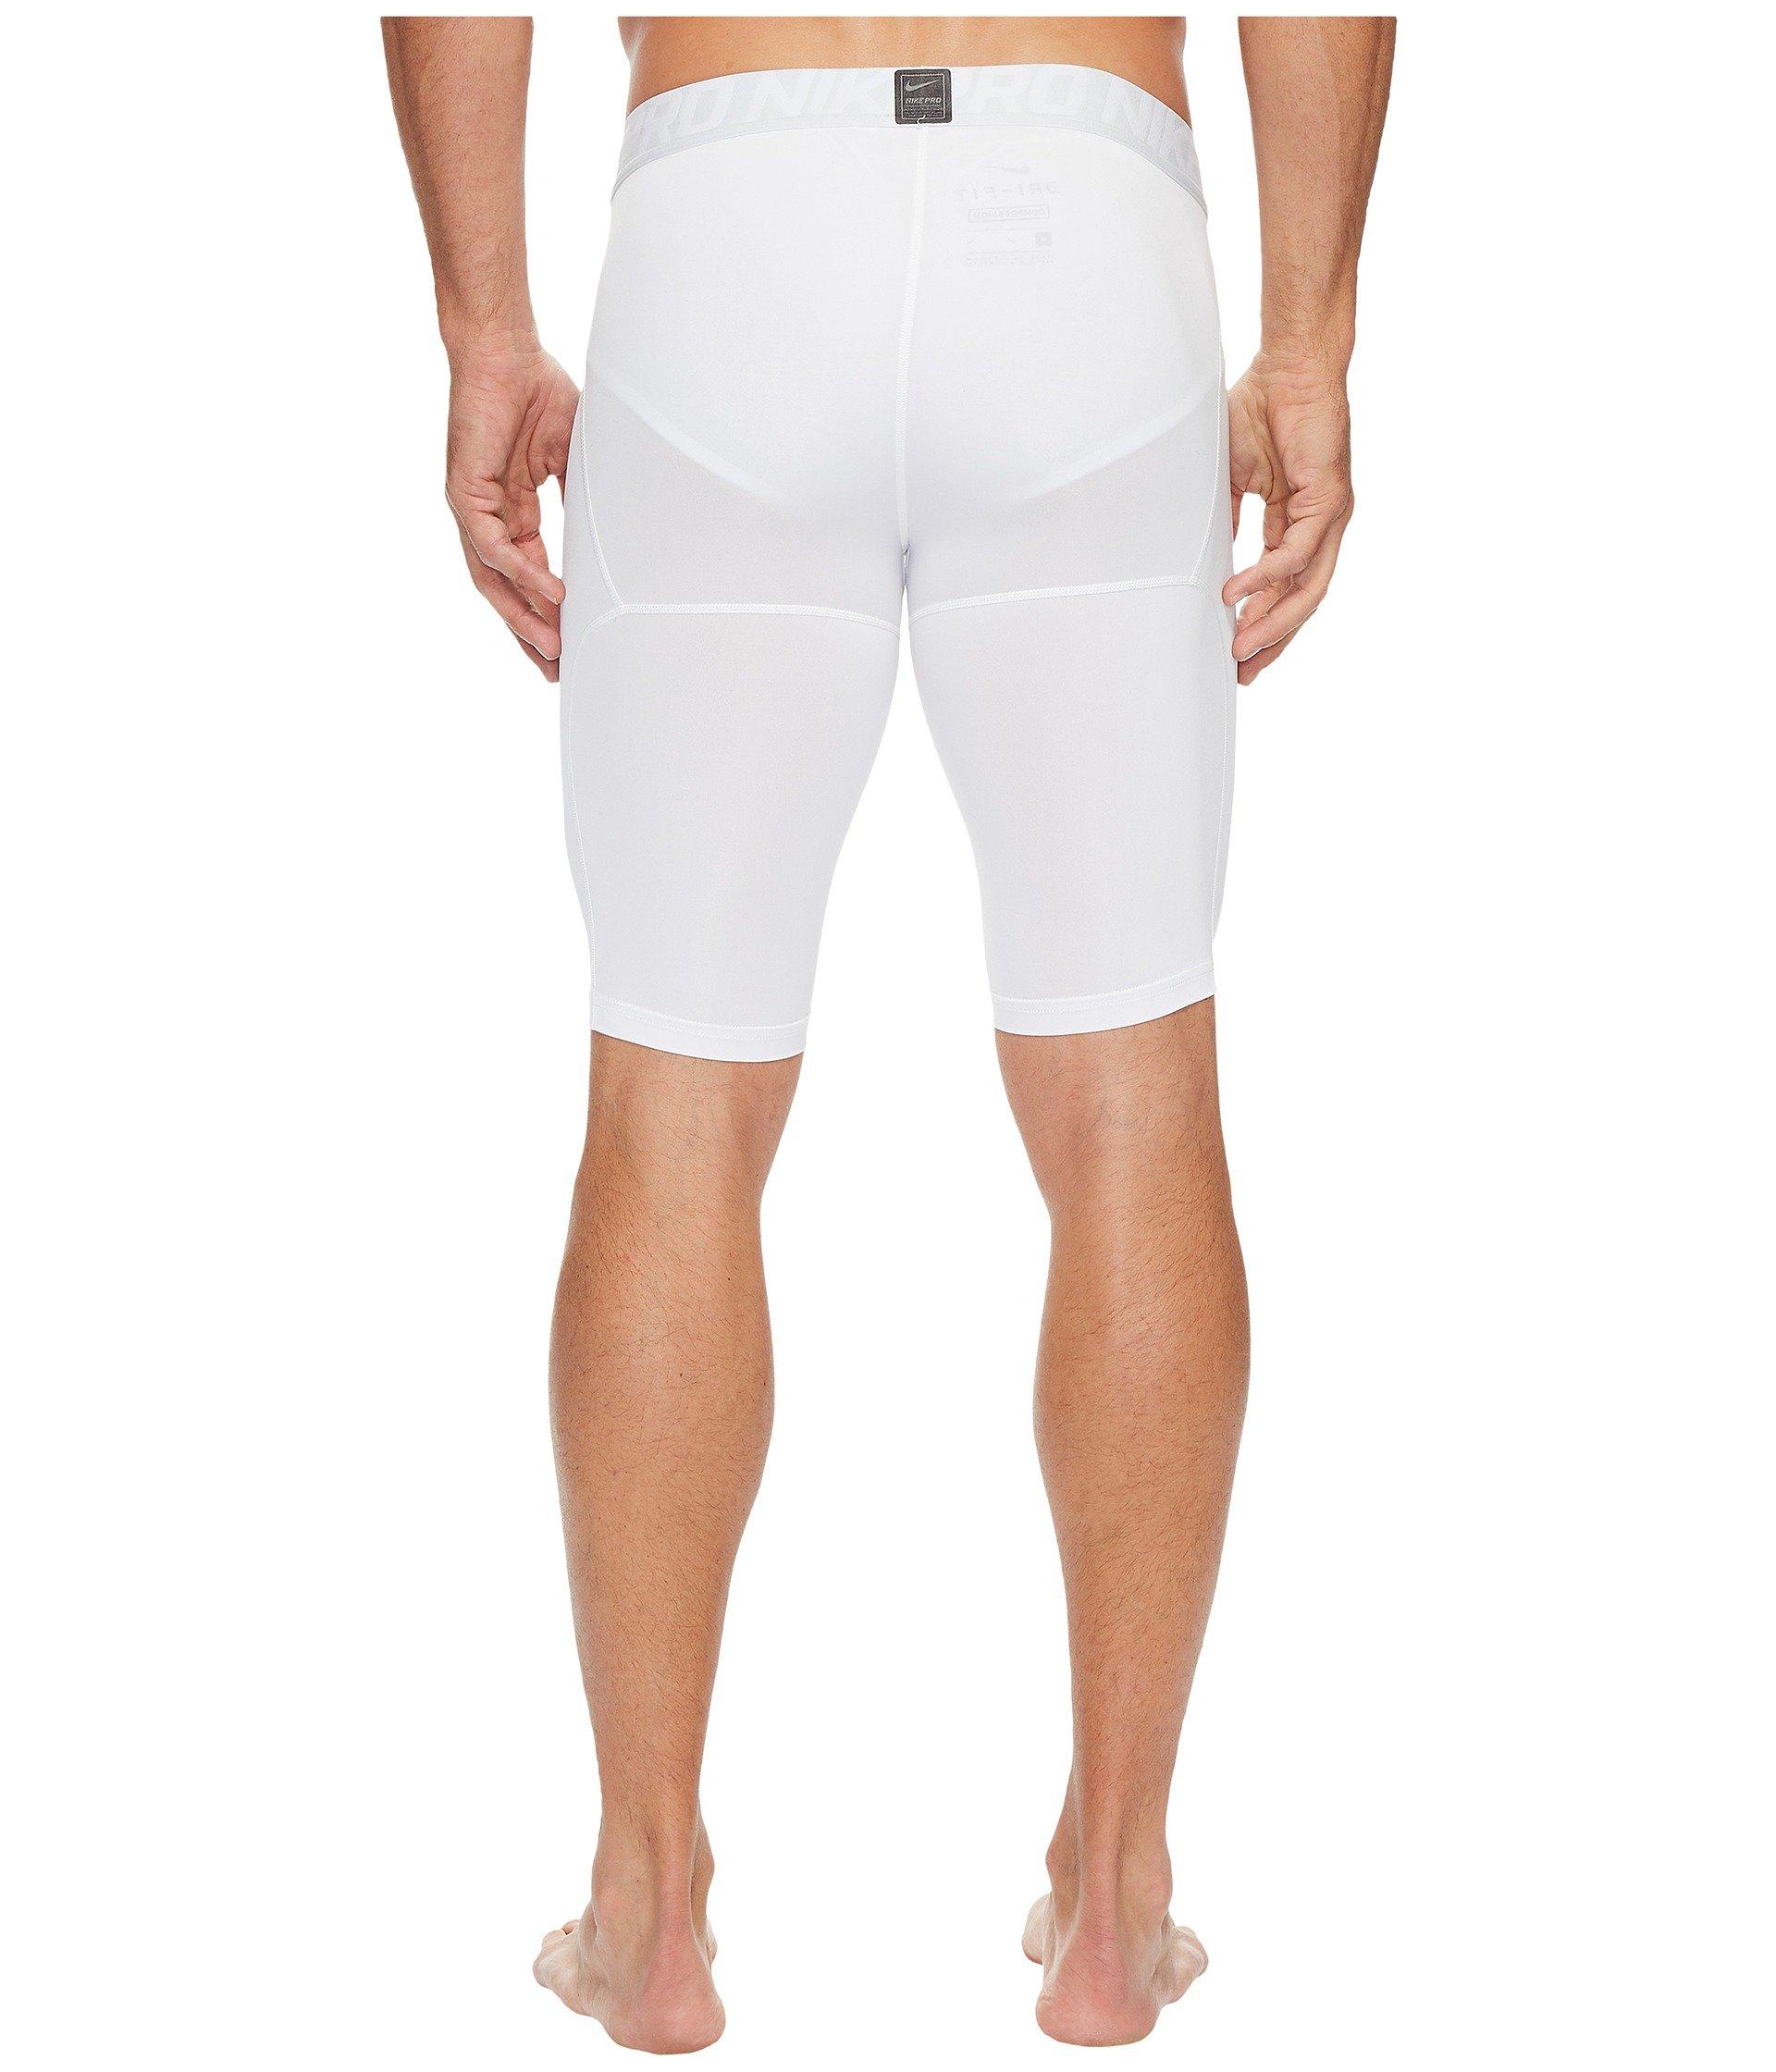 Nike Men's Pro Training Shorts, White/Pure Platinum/Black, Small by Nike (Image #4)